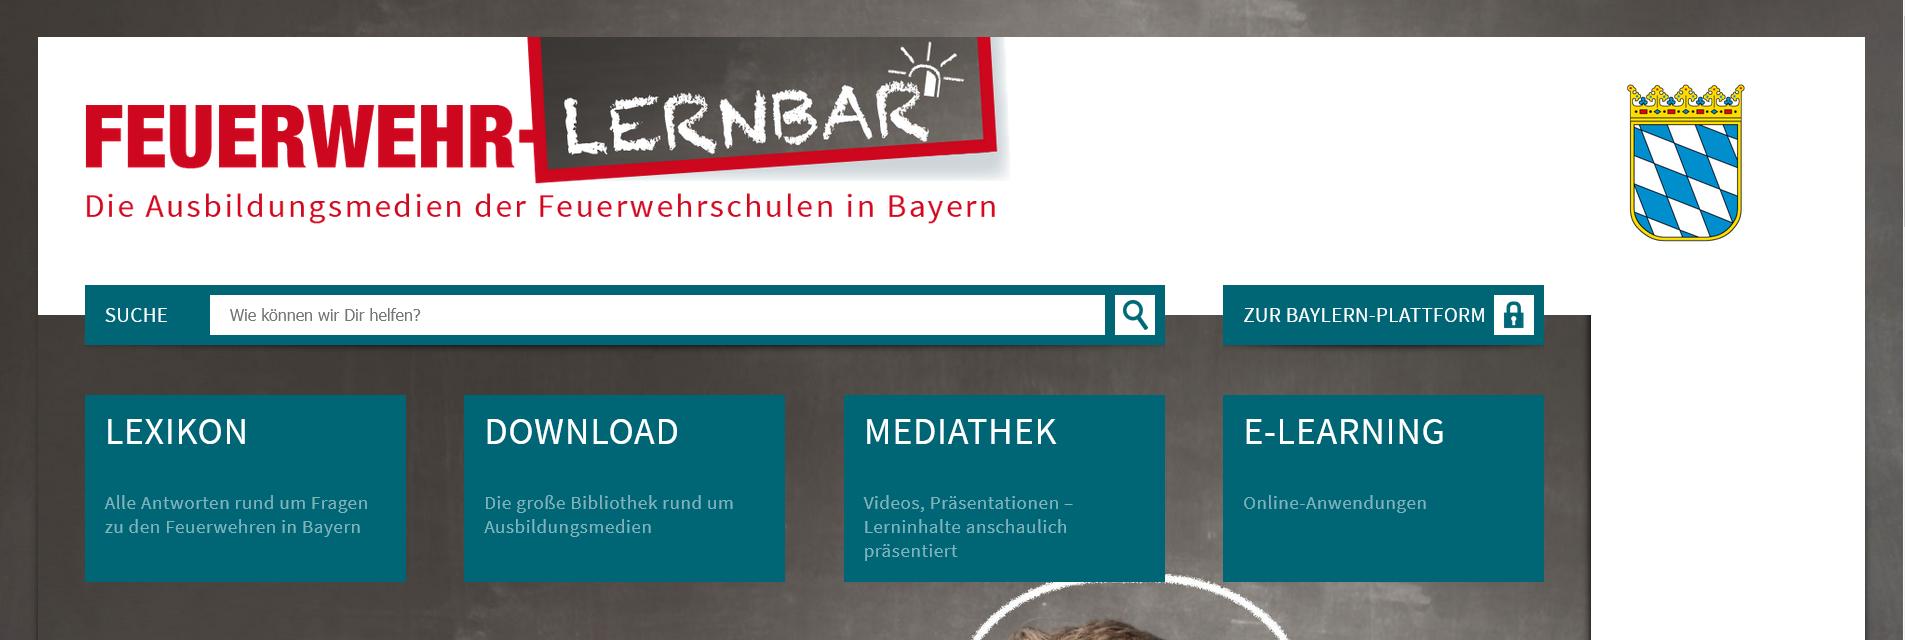 Screenshot – Infoseite Feuerwehr-Lernbar